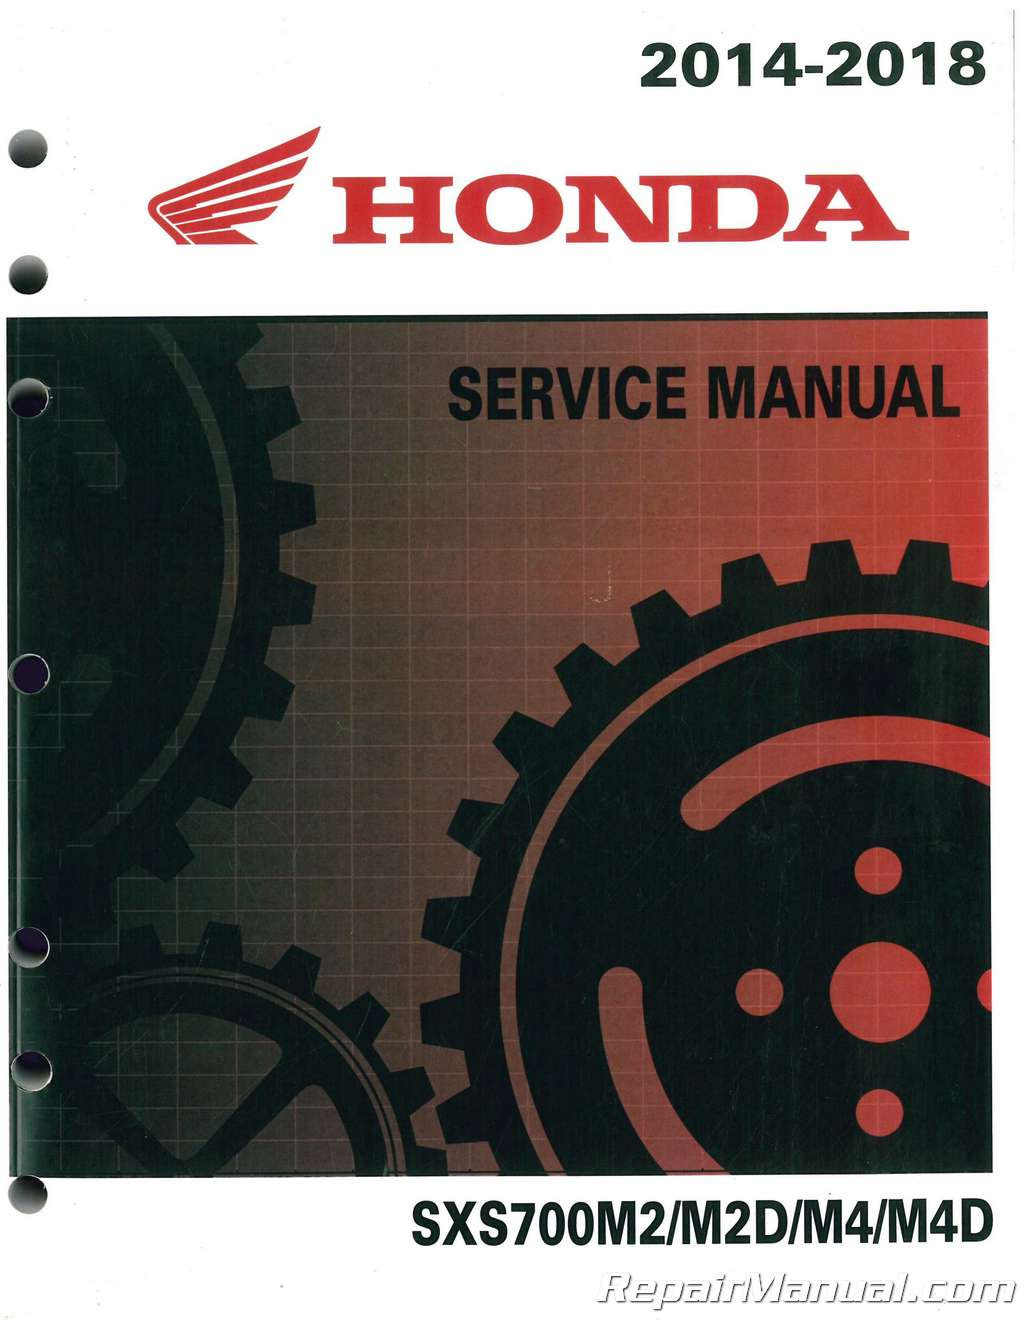 2014 2018 honda sxs700 m2 m4 pioneer utv service manual rh repairmanual com service manual pioneer sa 9800 service manual pioneer sa 9800